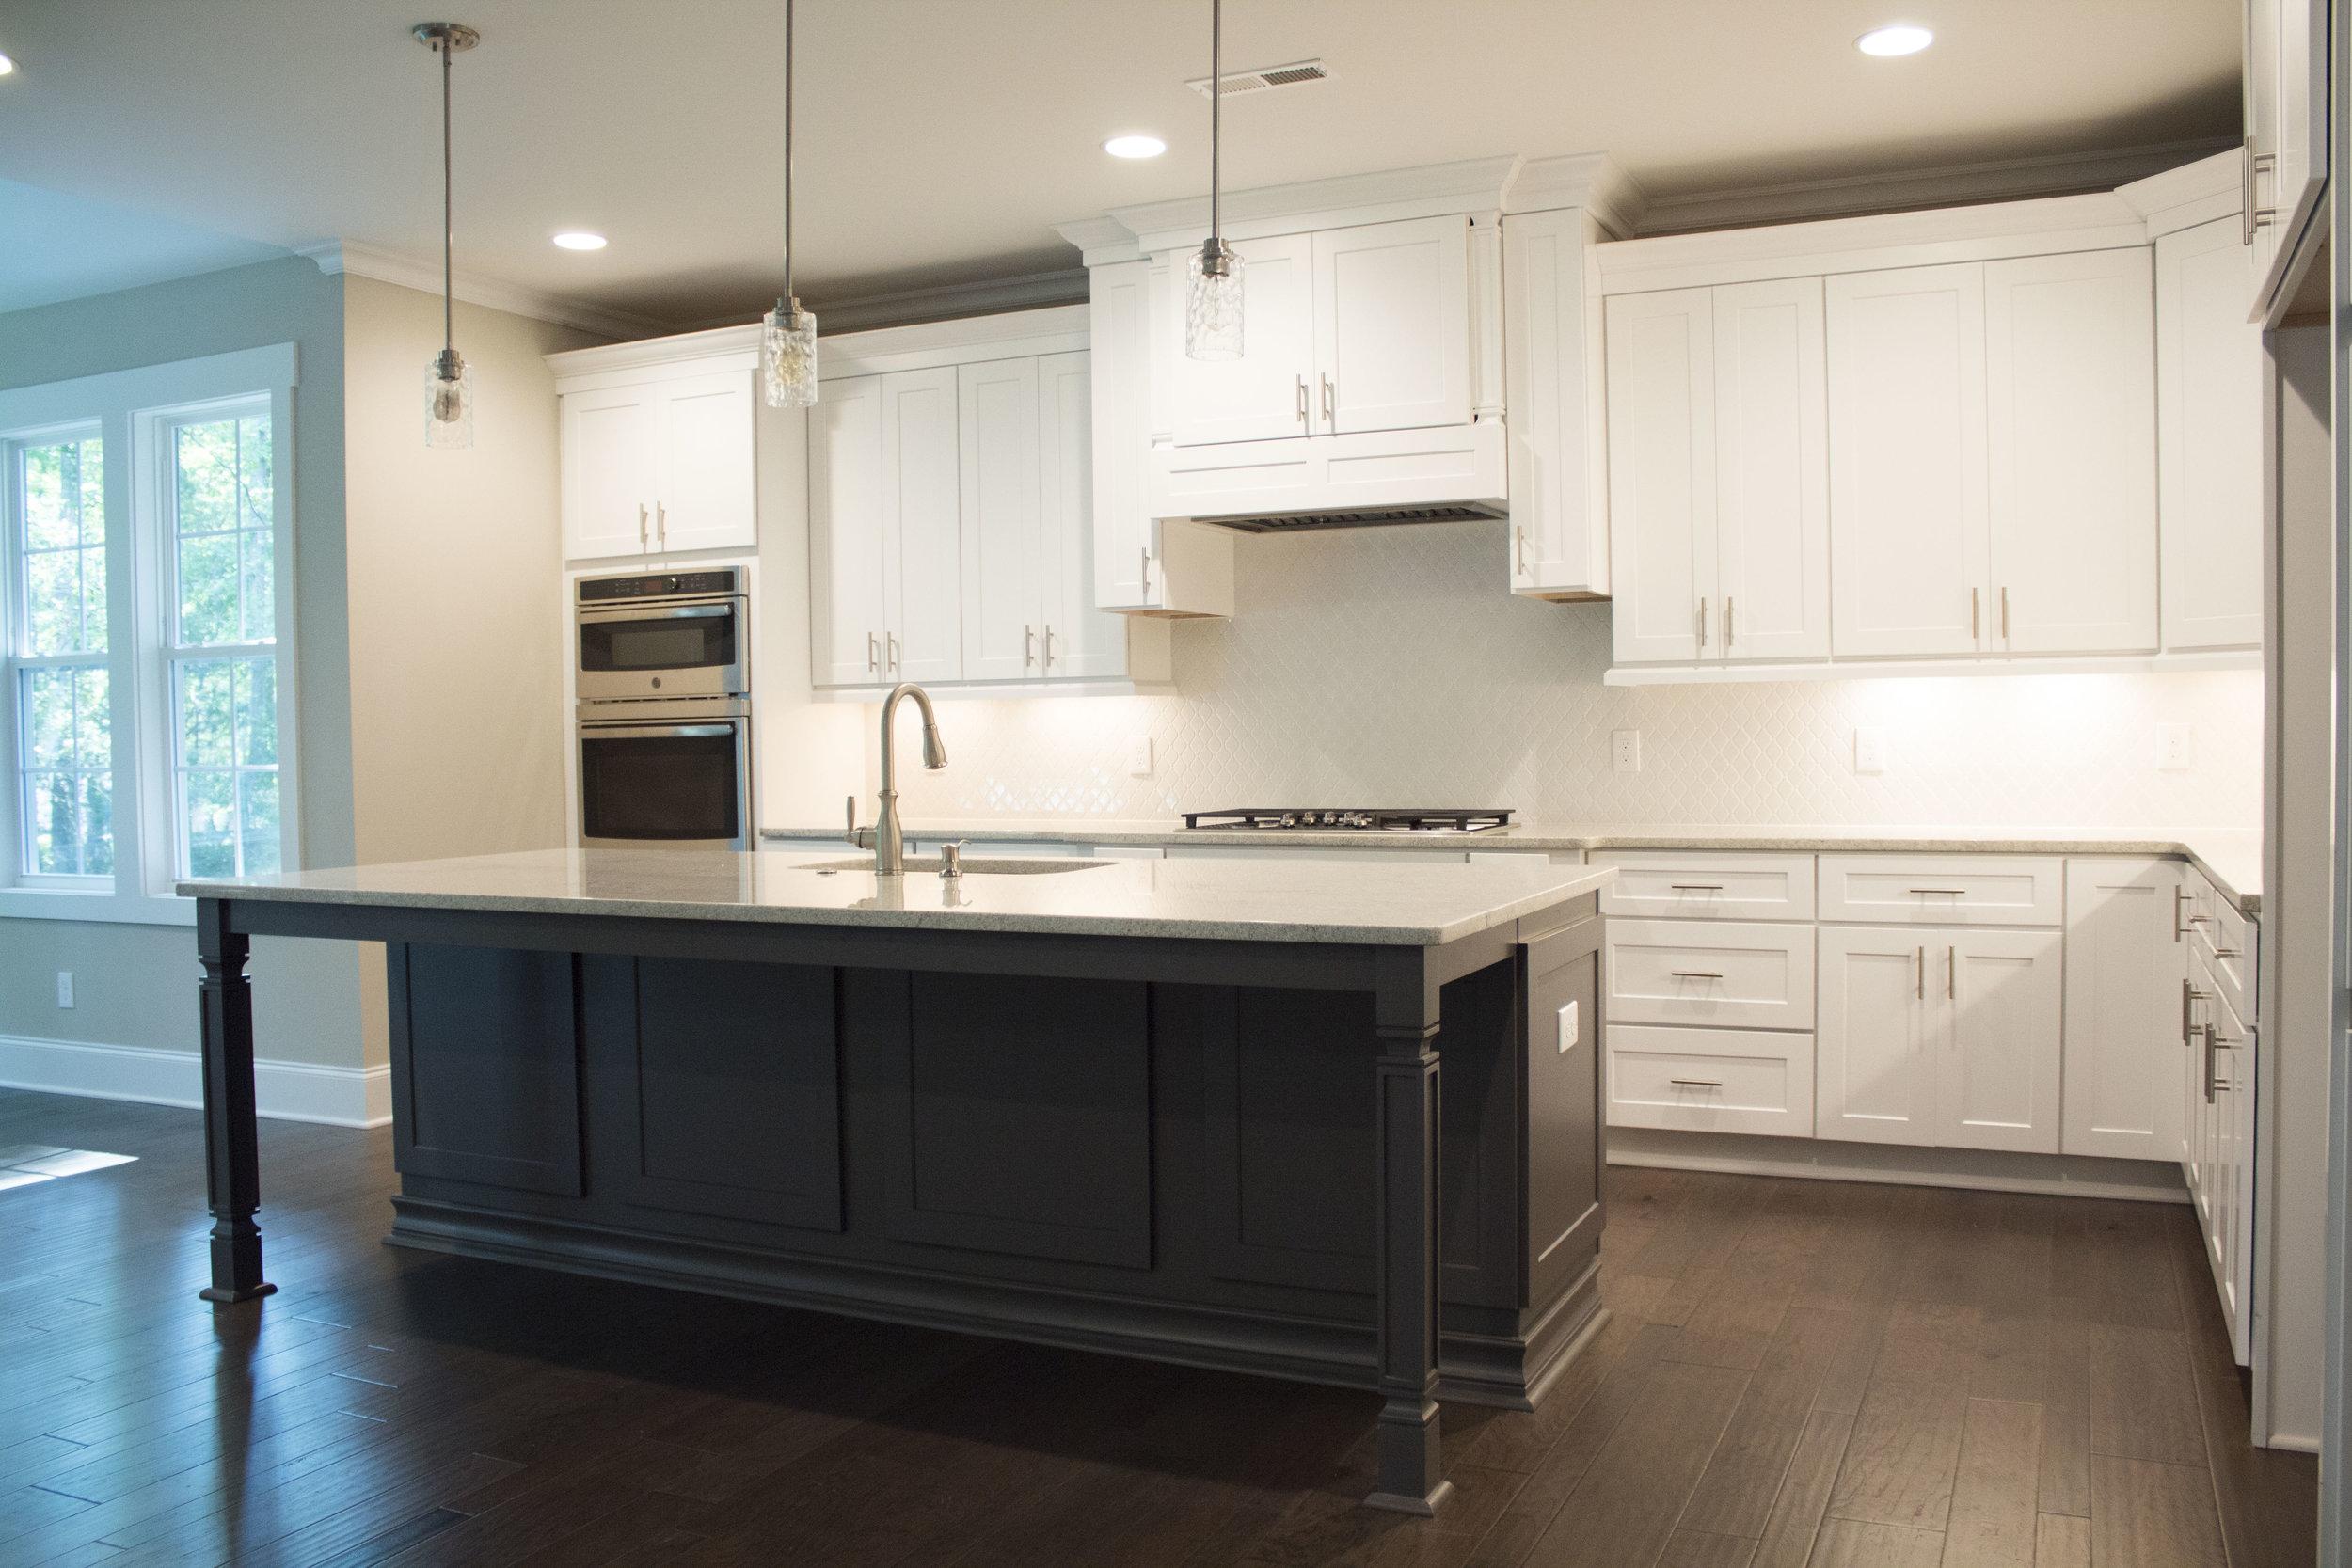 Custome_Kitchen_New_Home_1.jpg